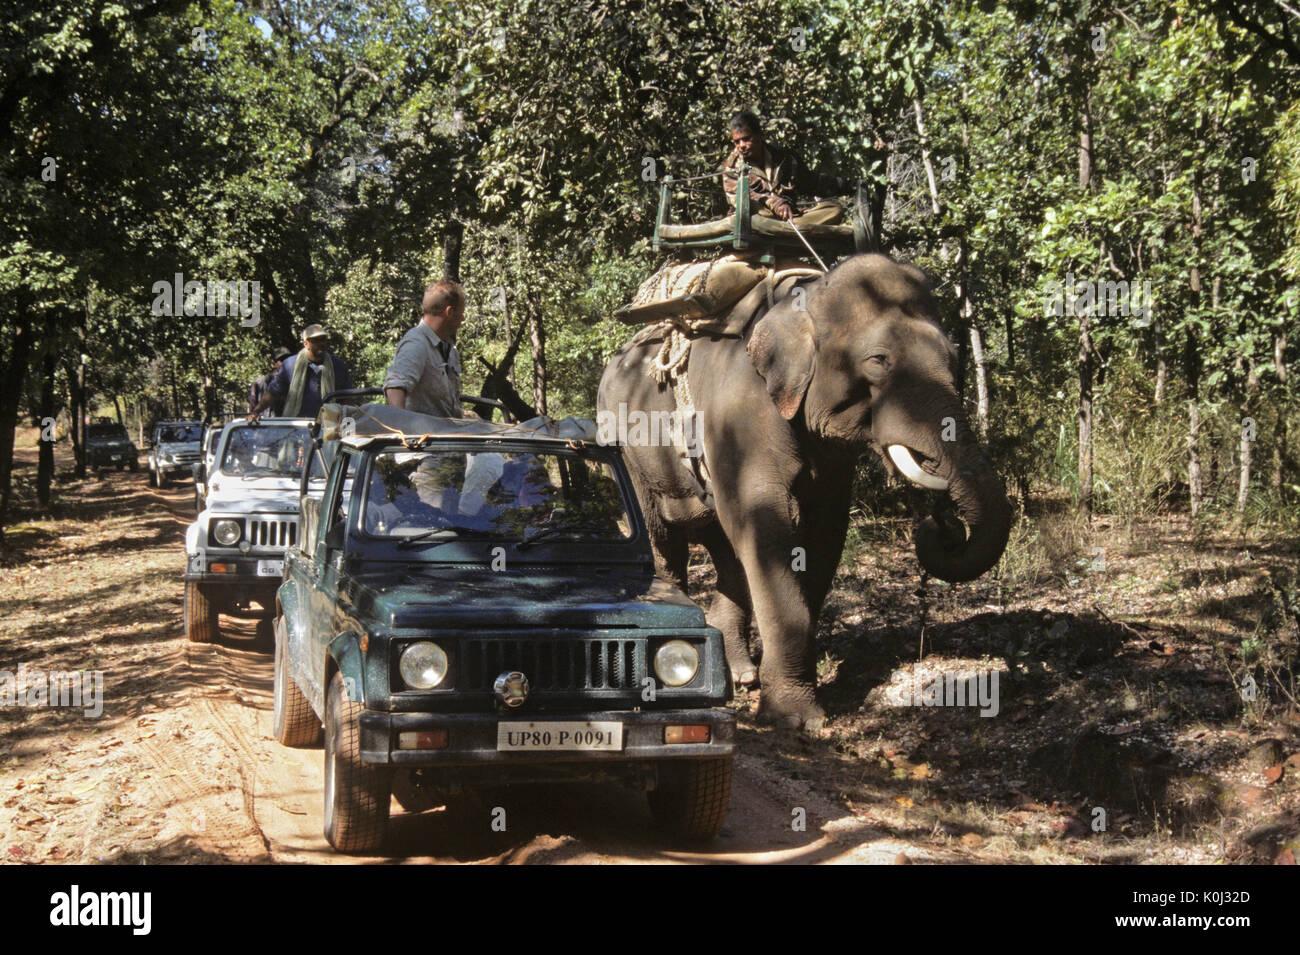 On safari in Bandhavgarh National Park, Madhya Pradesh, India - Stock Image